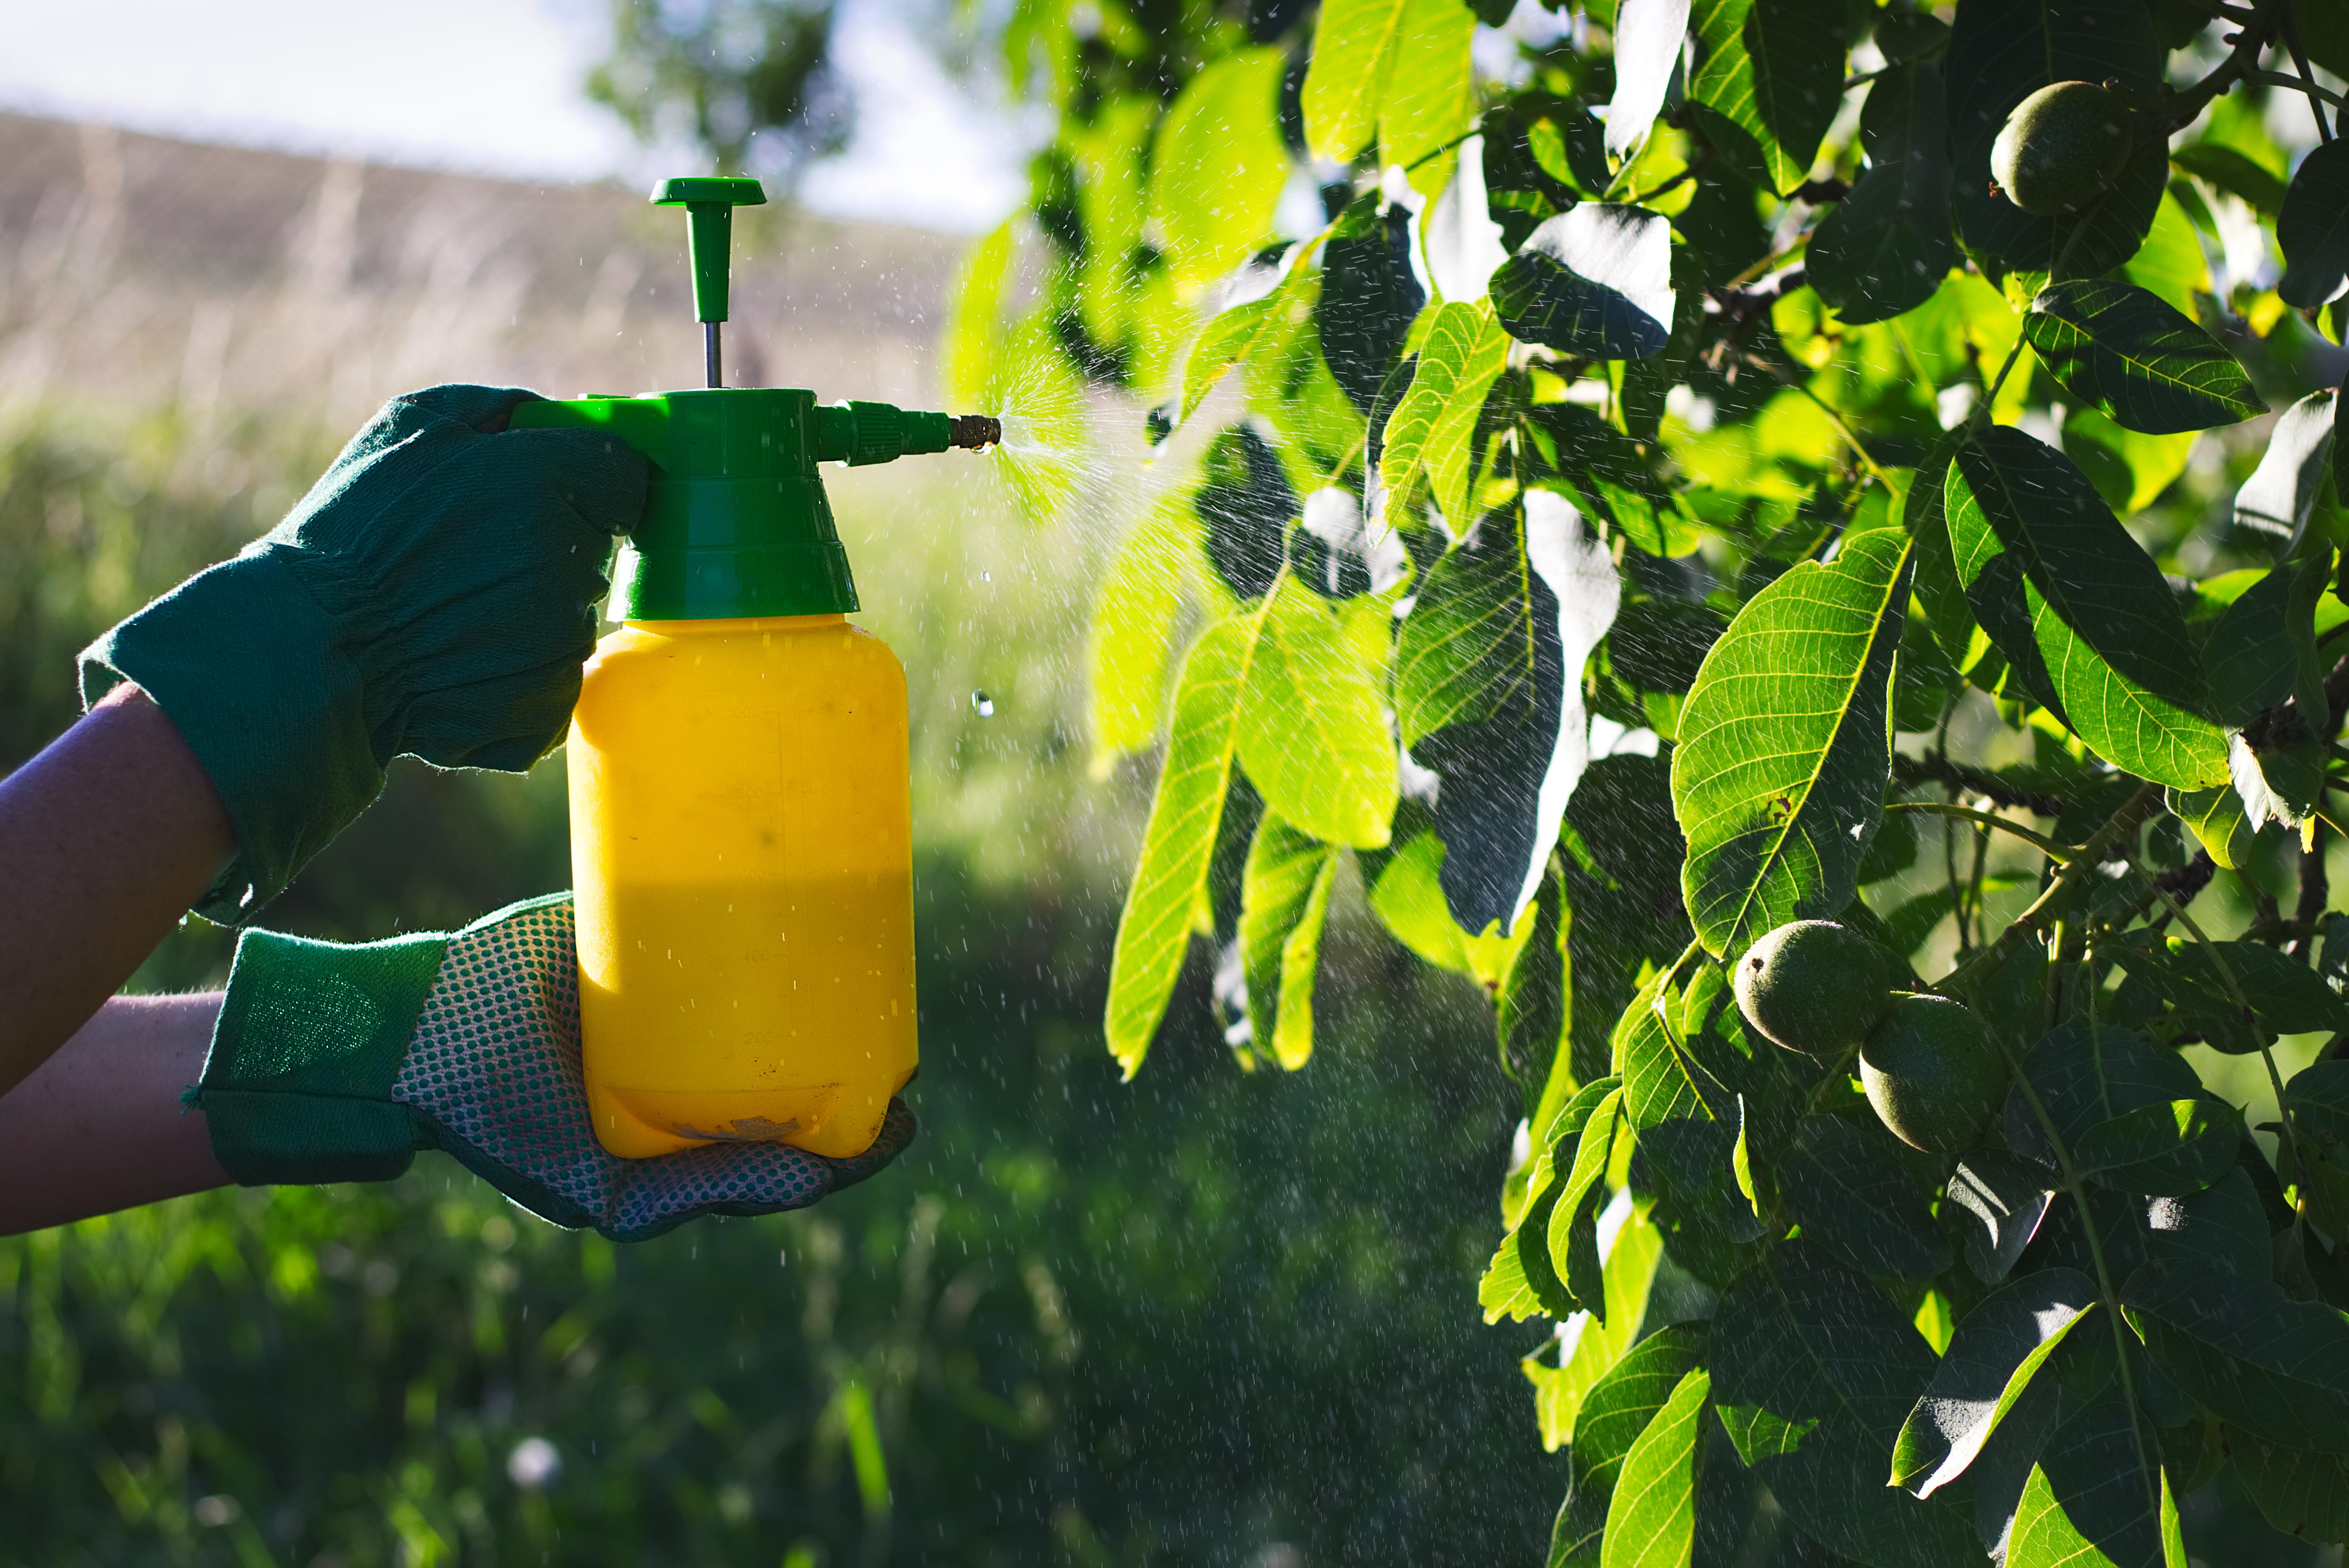 Homemade Organic Pesticide for Vegetables | Home Guides | SF Gate